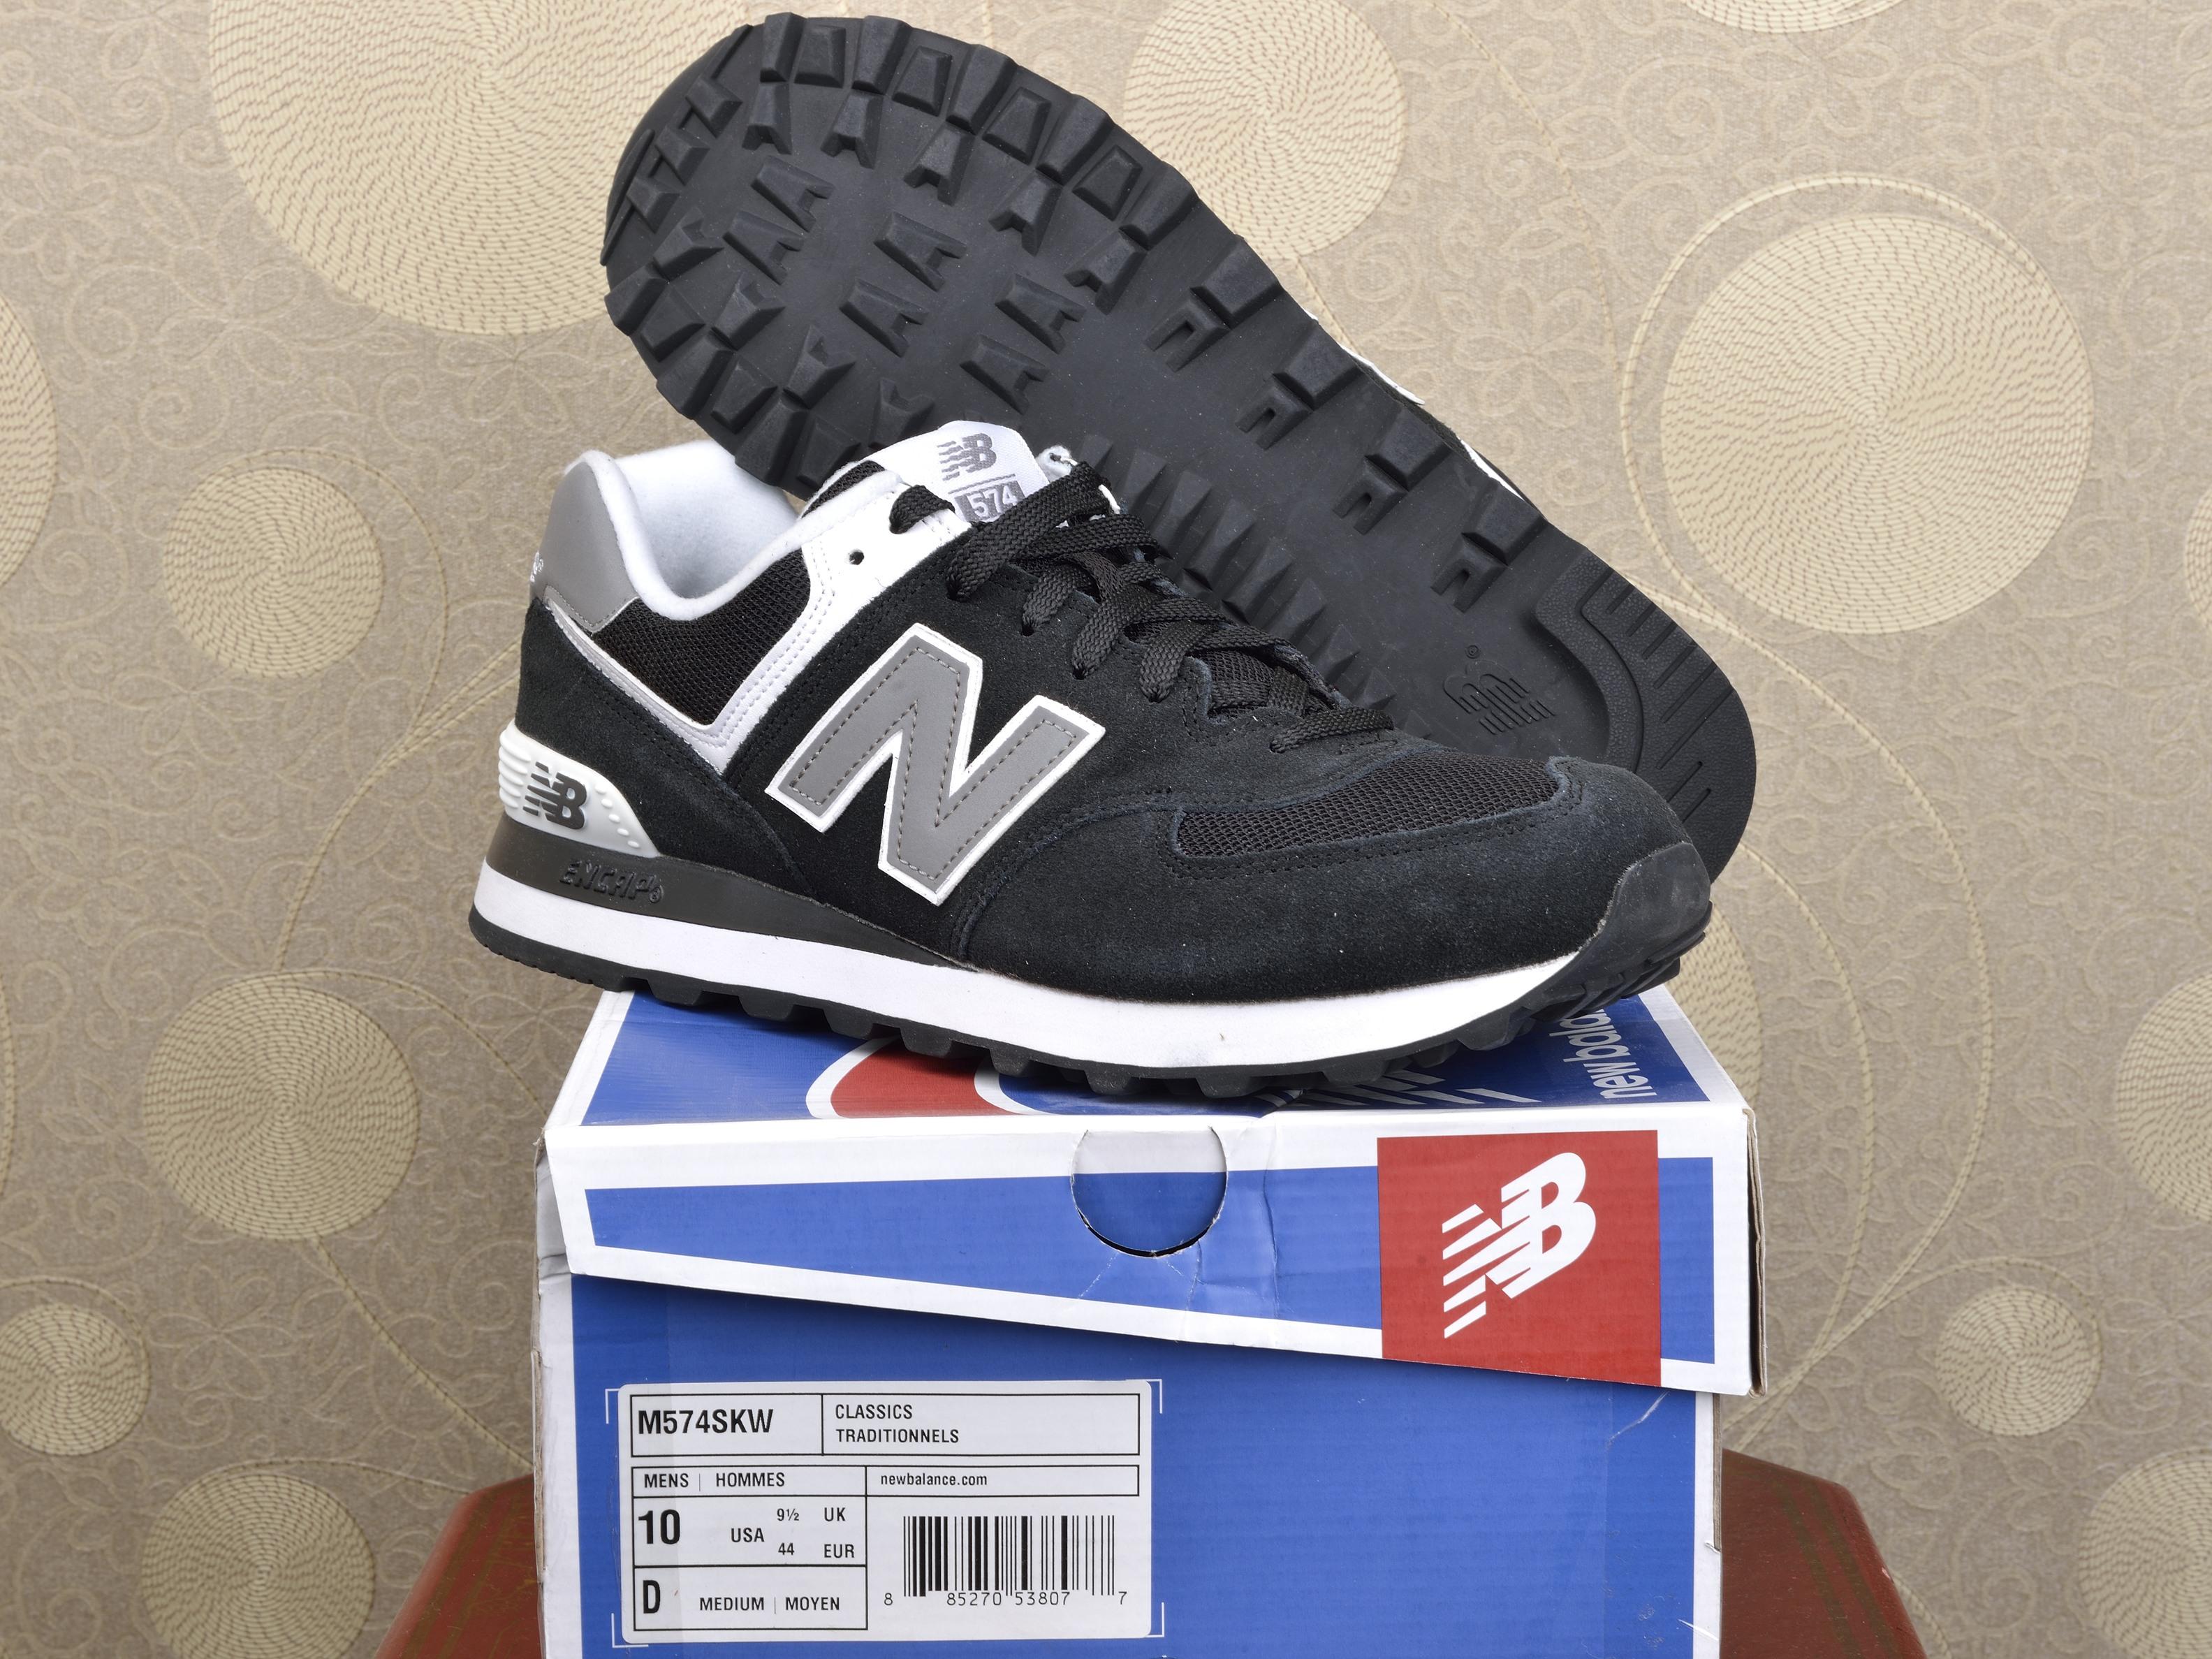 new products 012c1 e0b45 Аксессуары,одежда : Мужские кроссовки New Balance M574SKW